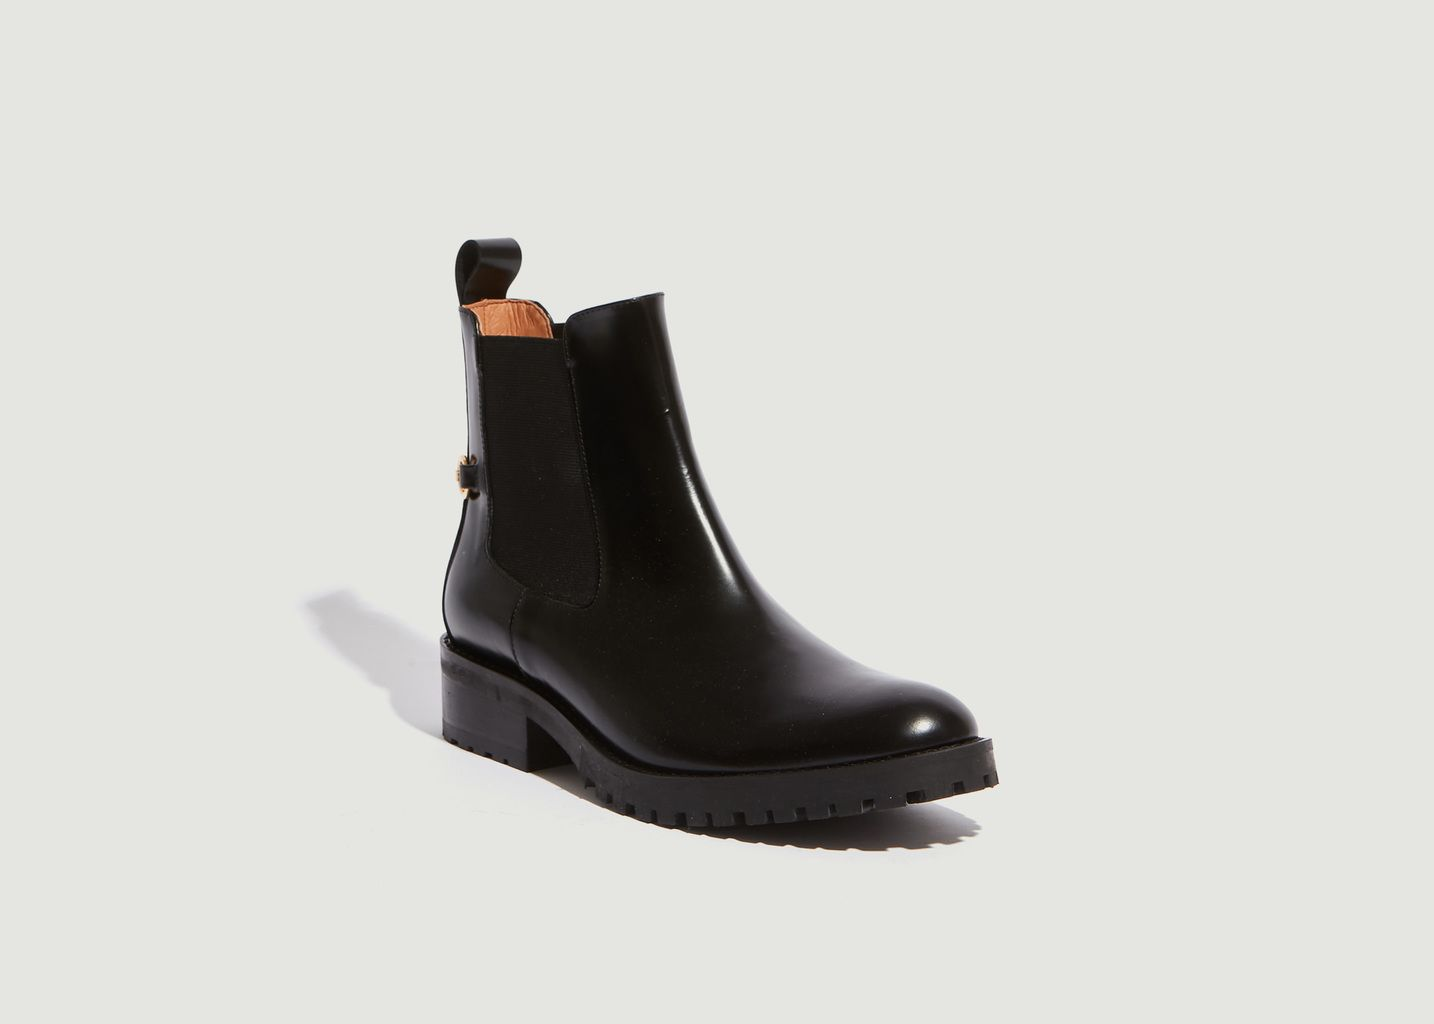 Boots Chelsea Milo - Petite Mendigote